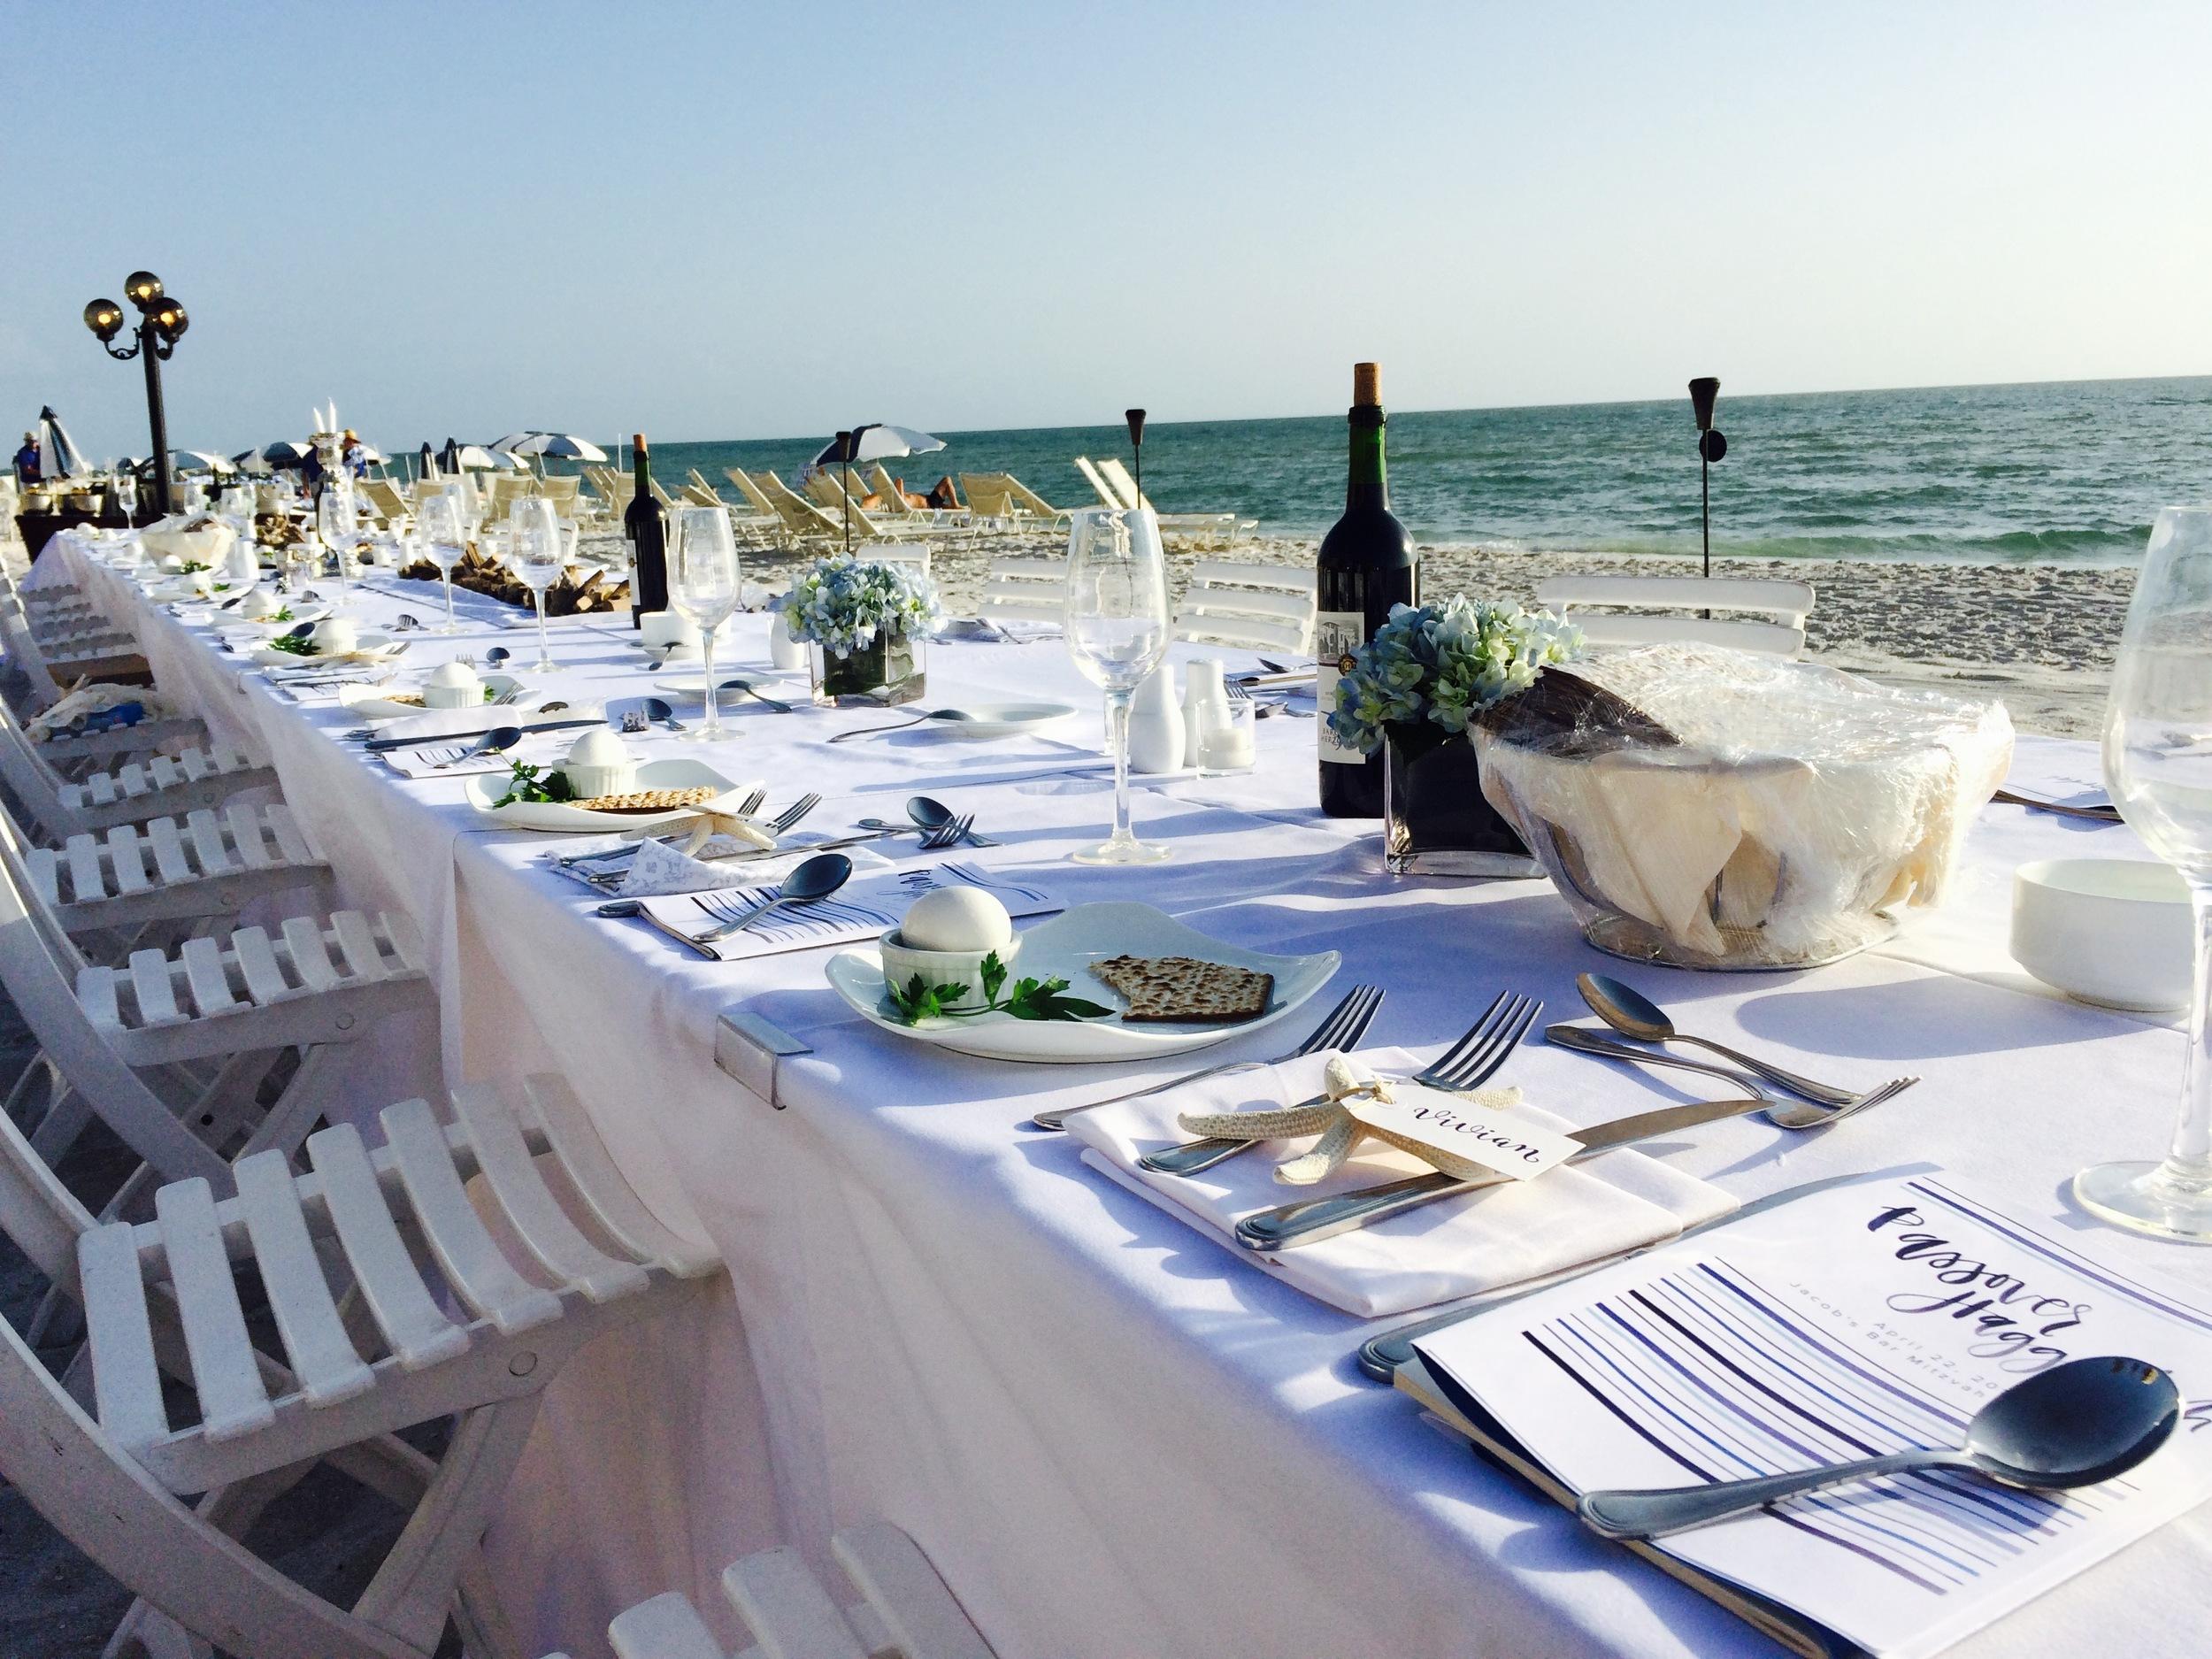 Seder dinner - iPhone photo